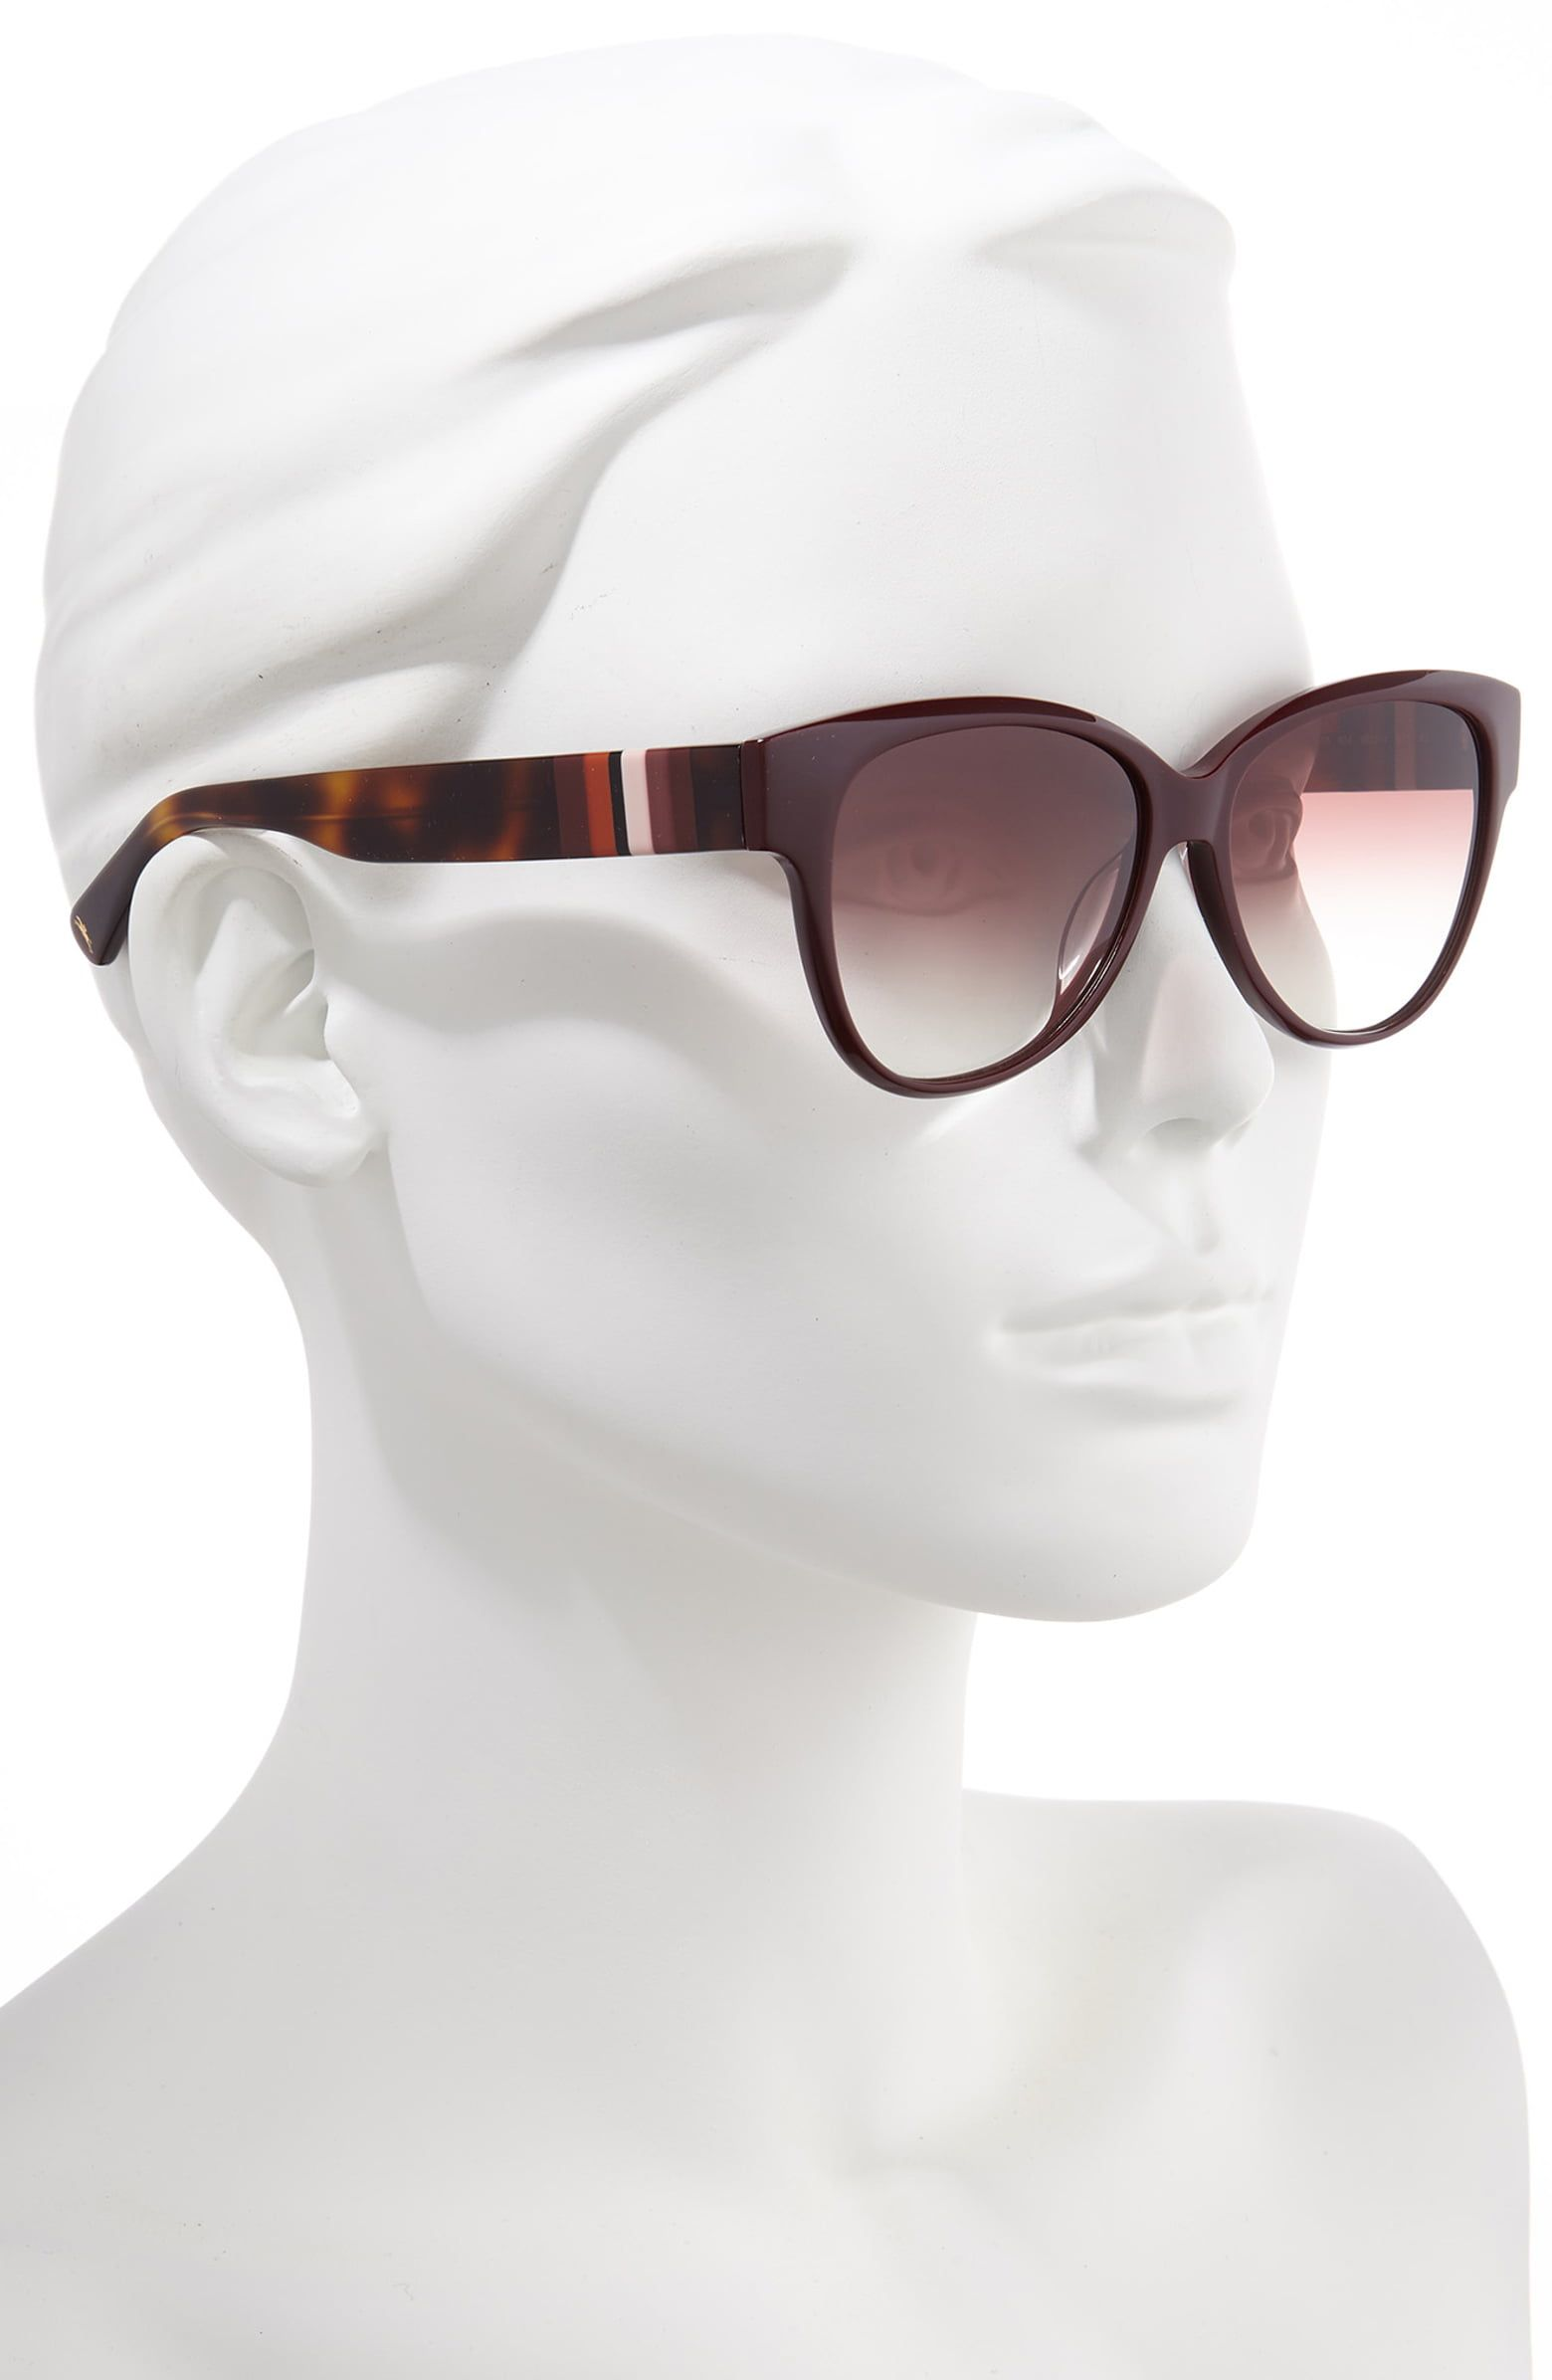 0f23c048b15a Longchamp Heritage Stripes 56mm Gradient Sunglasses | Nordstrom ...